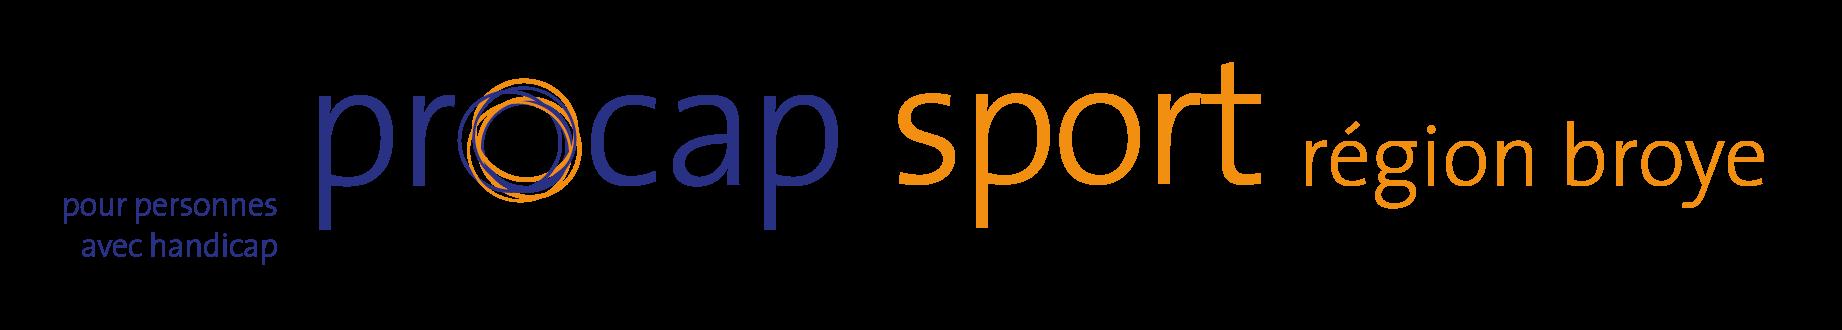 Procap Sport Broye